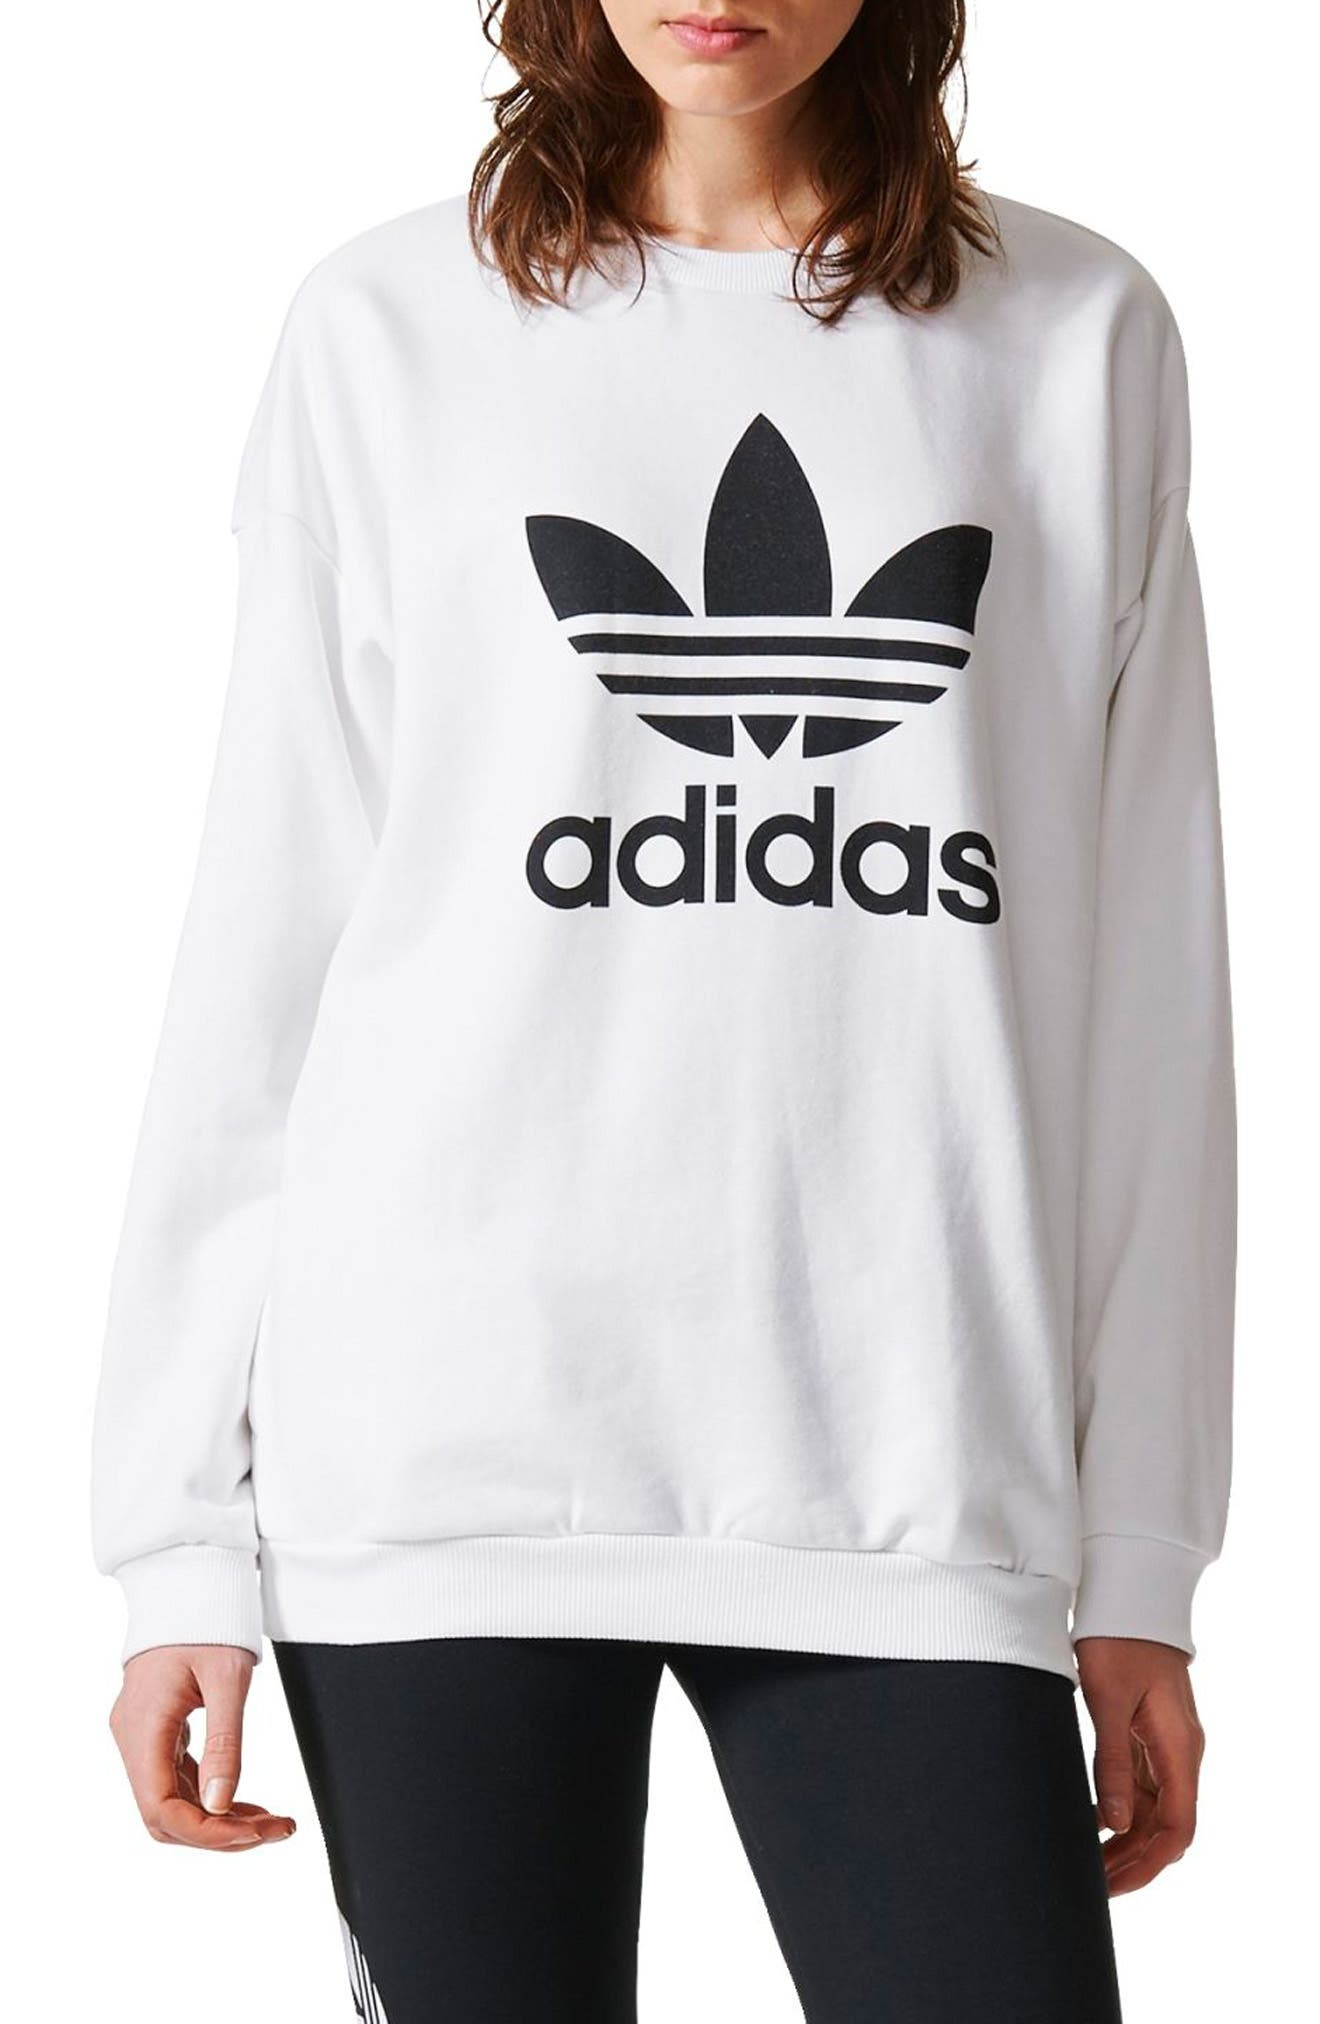 Originals Trefoil Crewneck Sweatshirt,                         Main,                         color, White